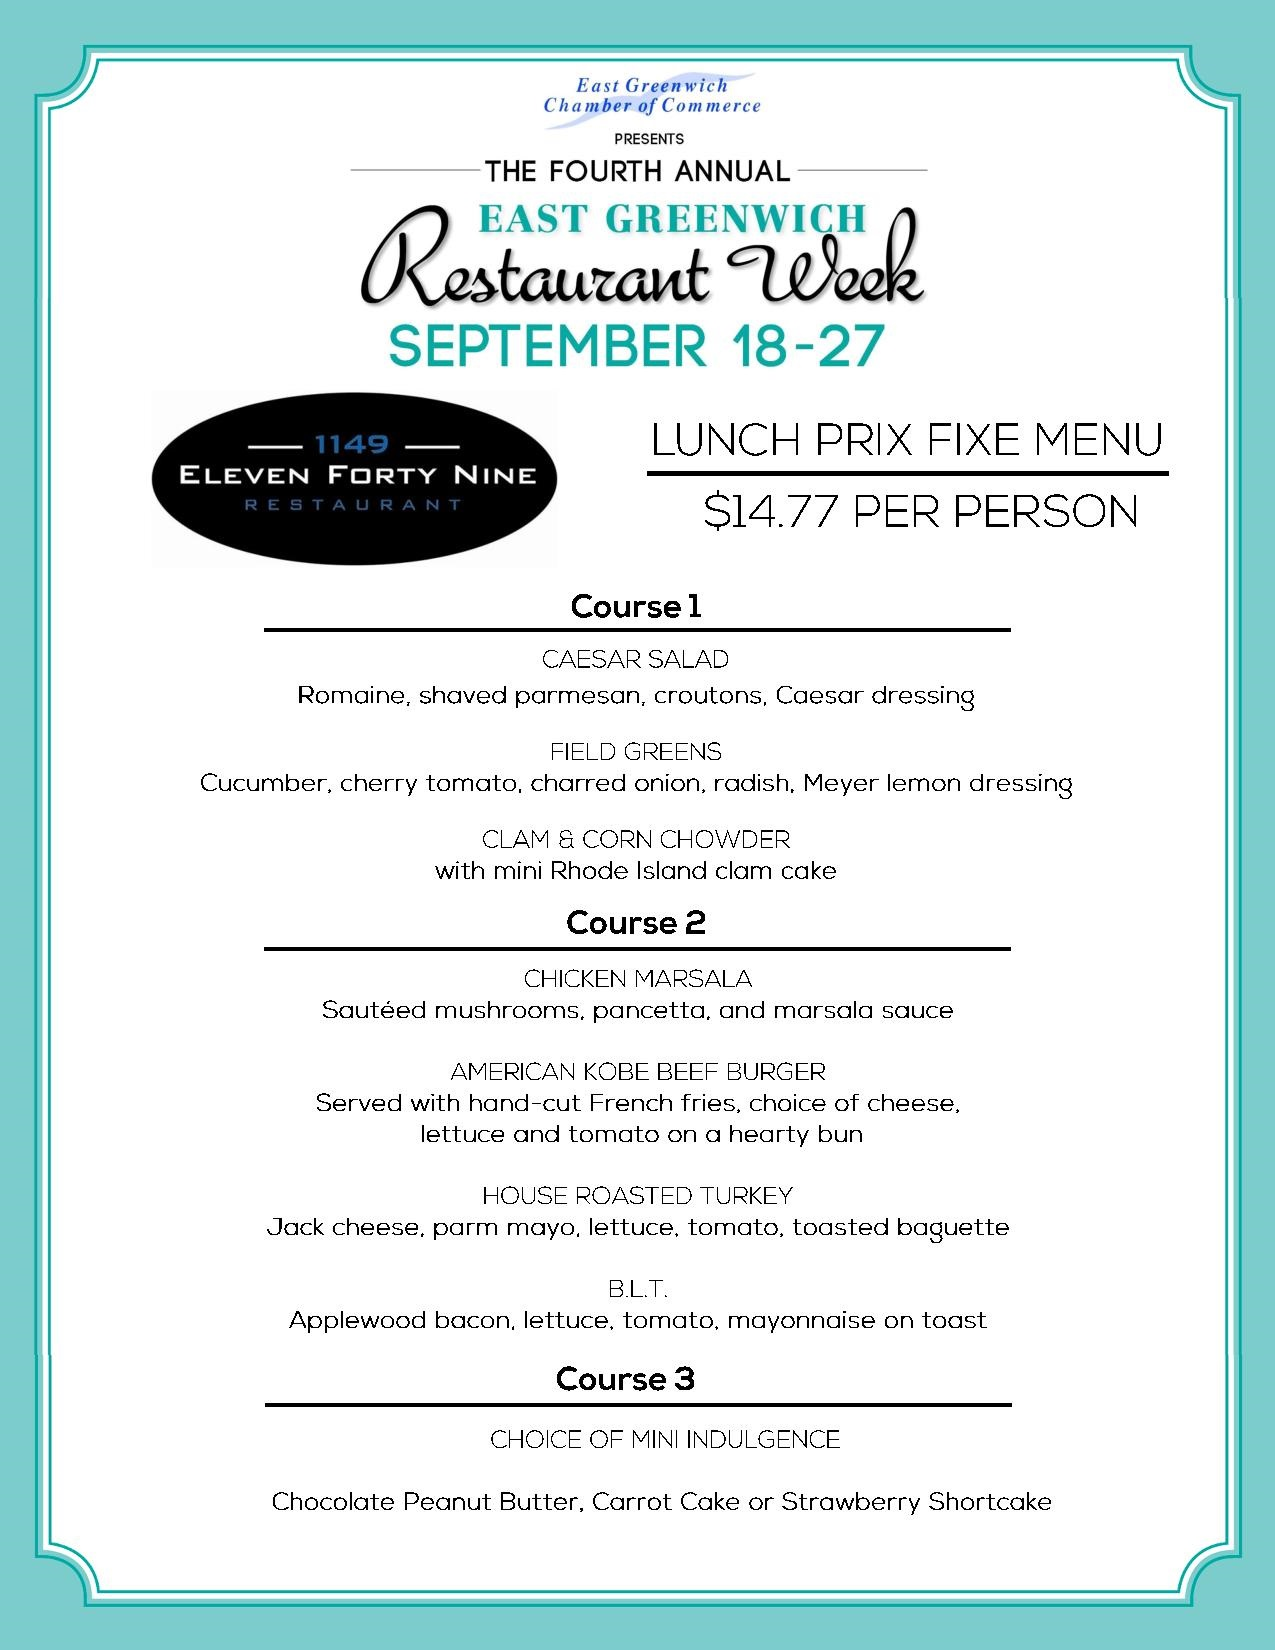 1149 Restaurant Week Menu East Greenwich Chamber Of